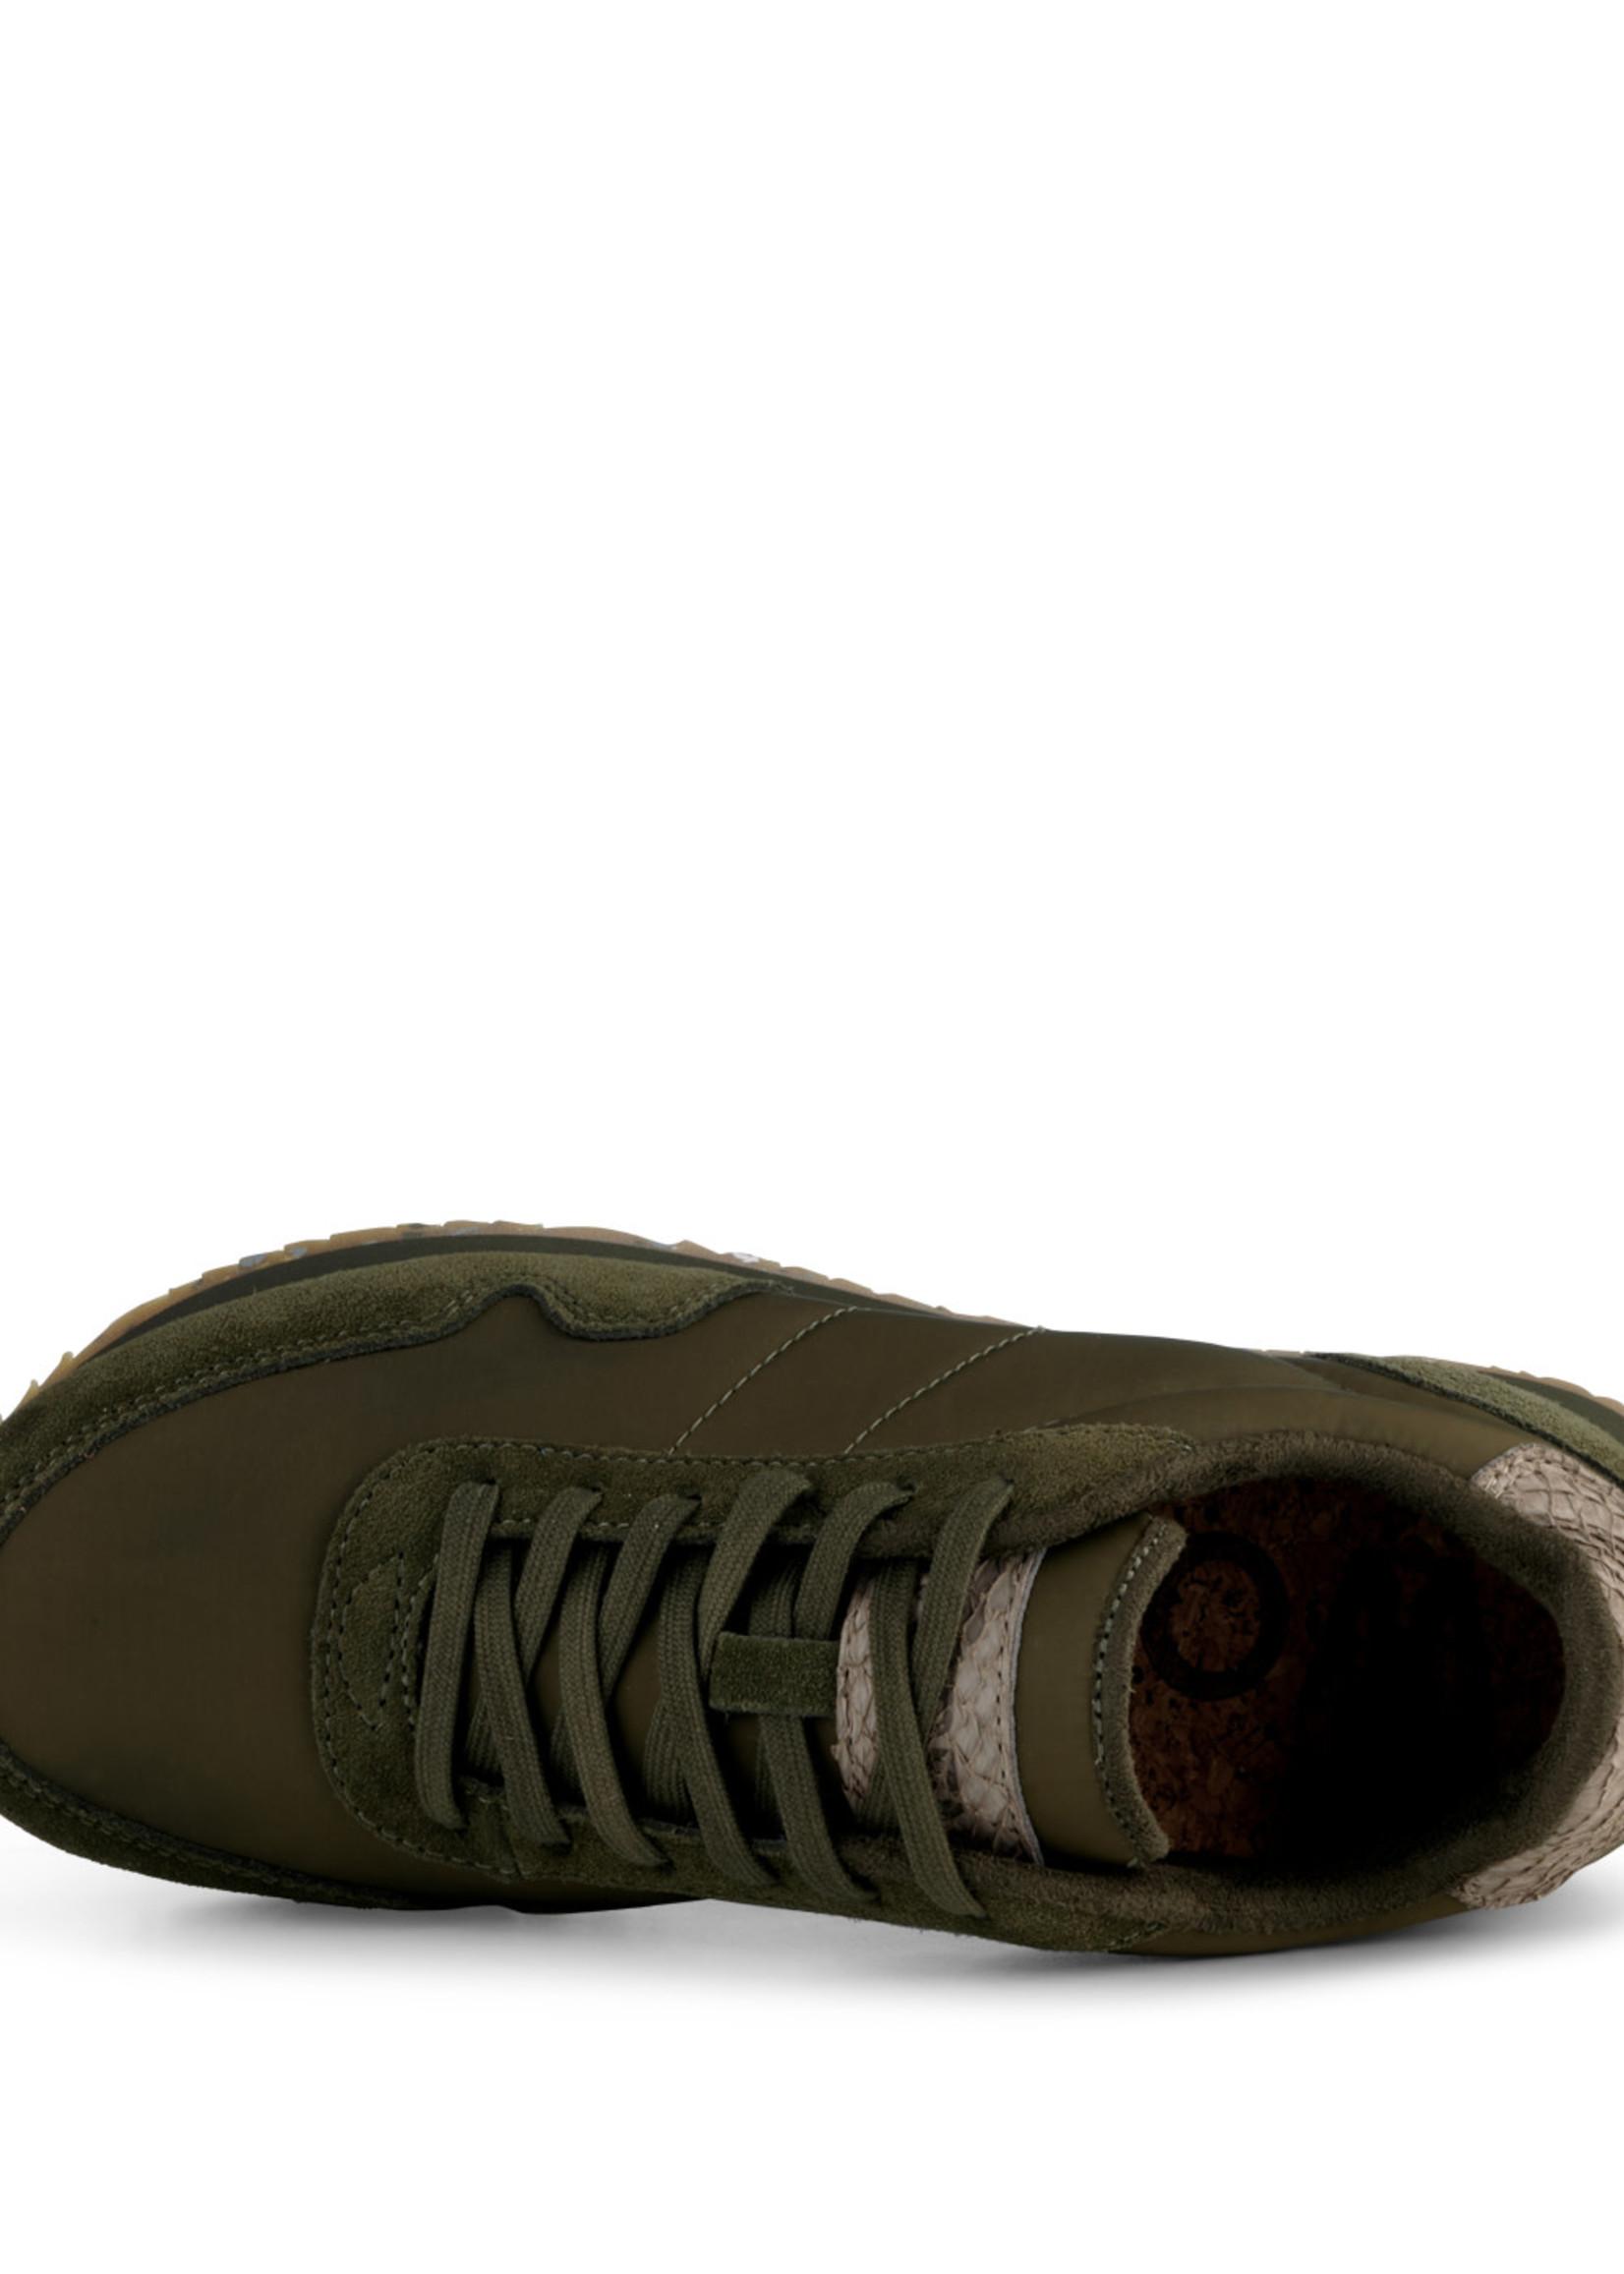 Woden Woden - Nora III Leather Sneaker - Dark Olive